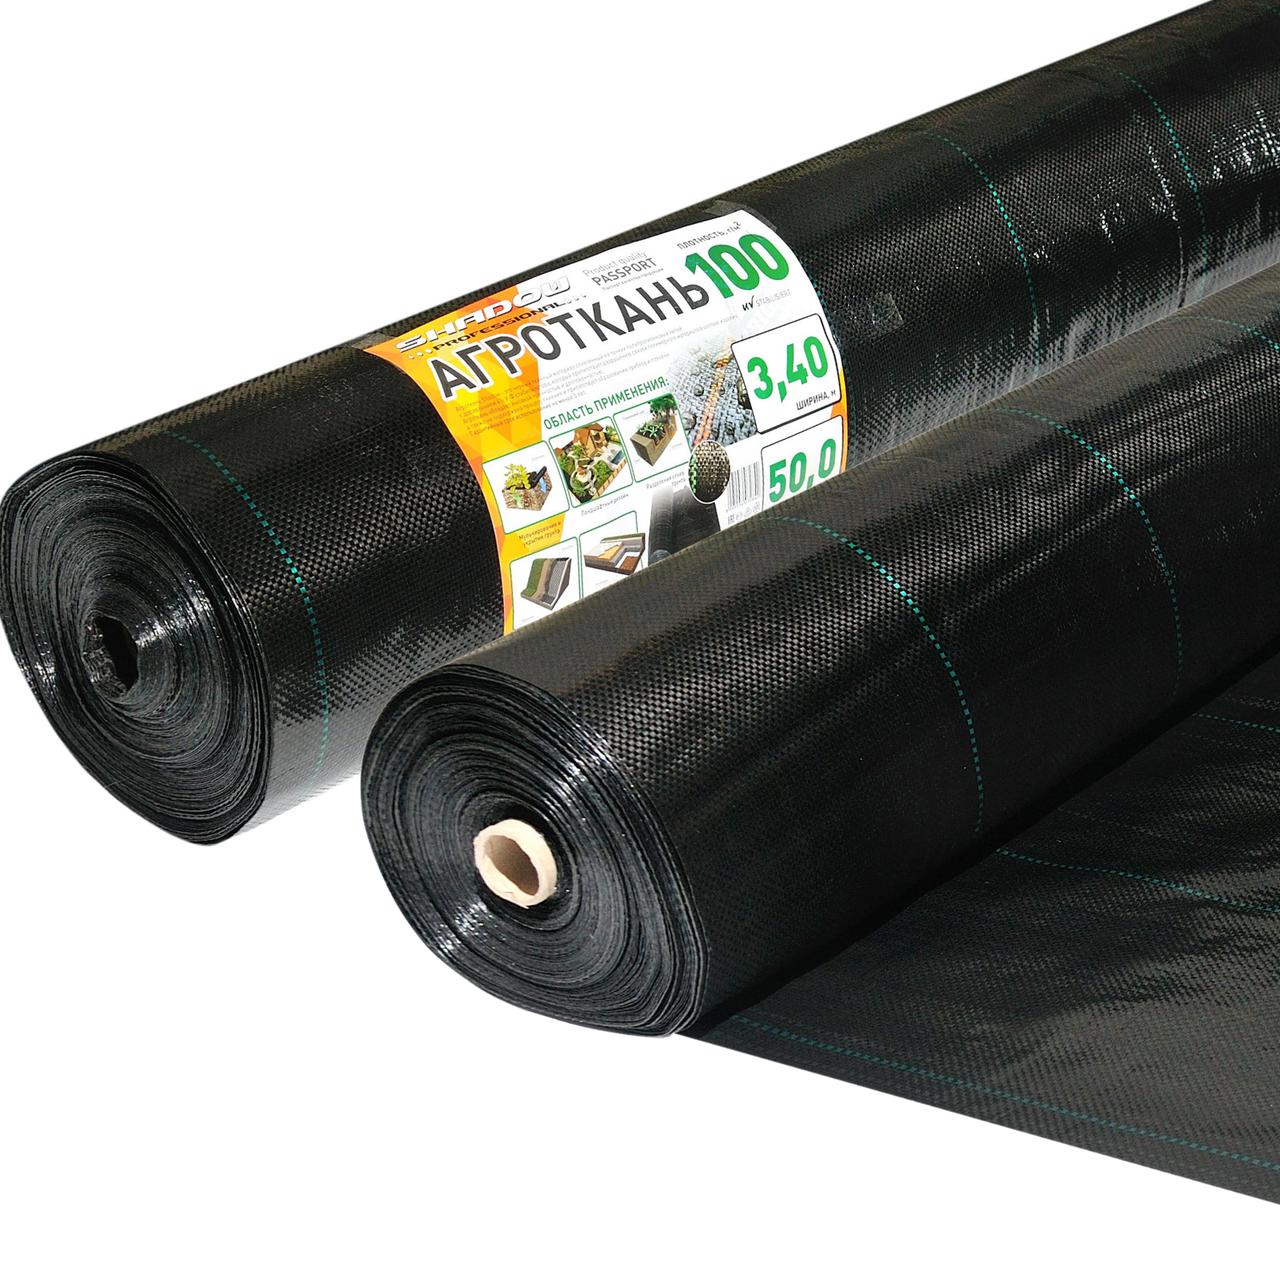 Агроткань 100 г/м² черная  3.4 х 50 метров